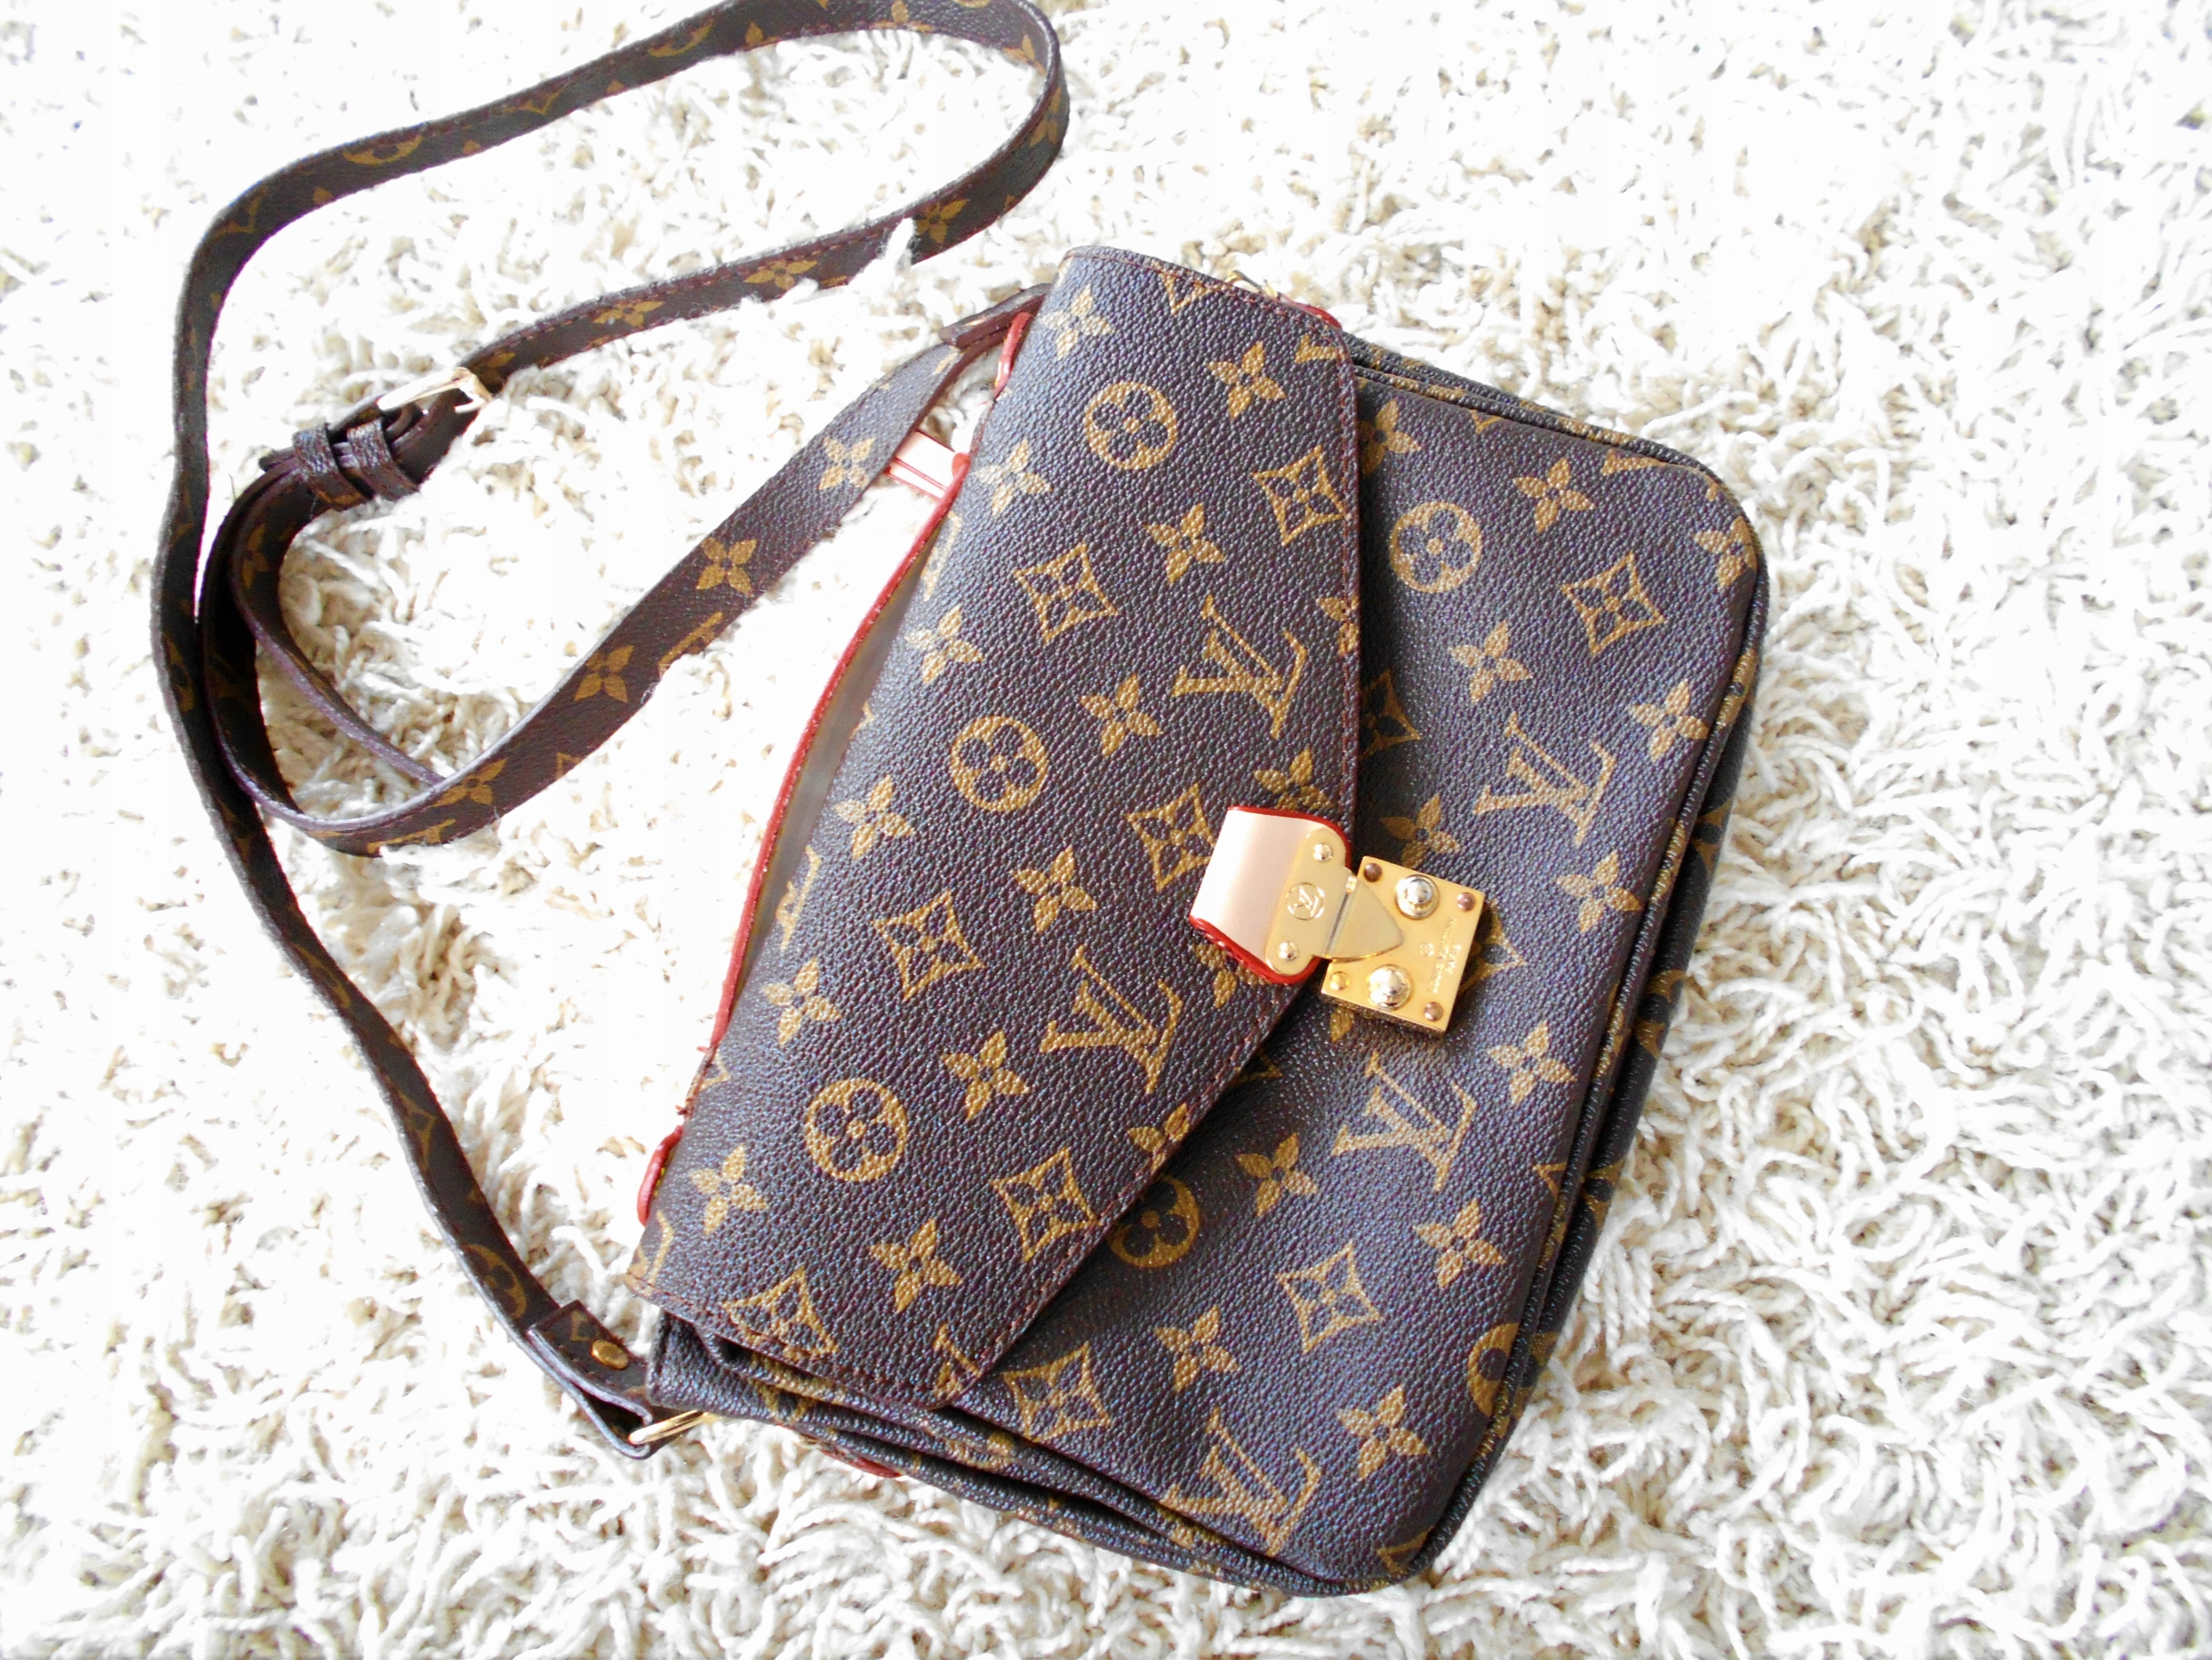 3640a7c5234b8 torebka Louis Vuitton LV monogram jak nowa - 7466390273 - oficjalne ...